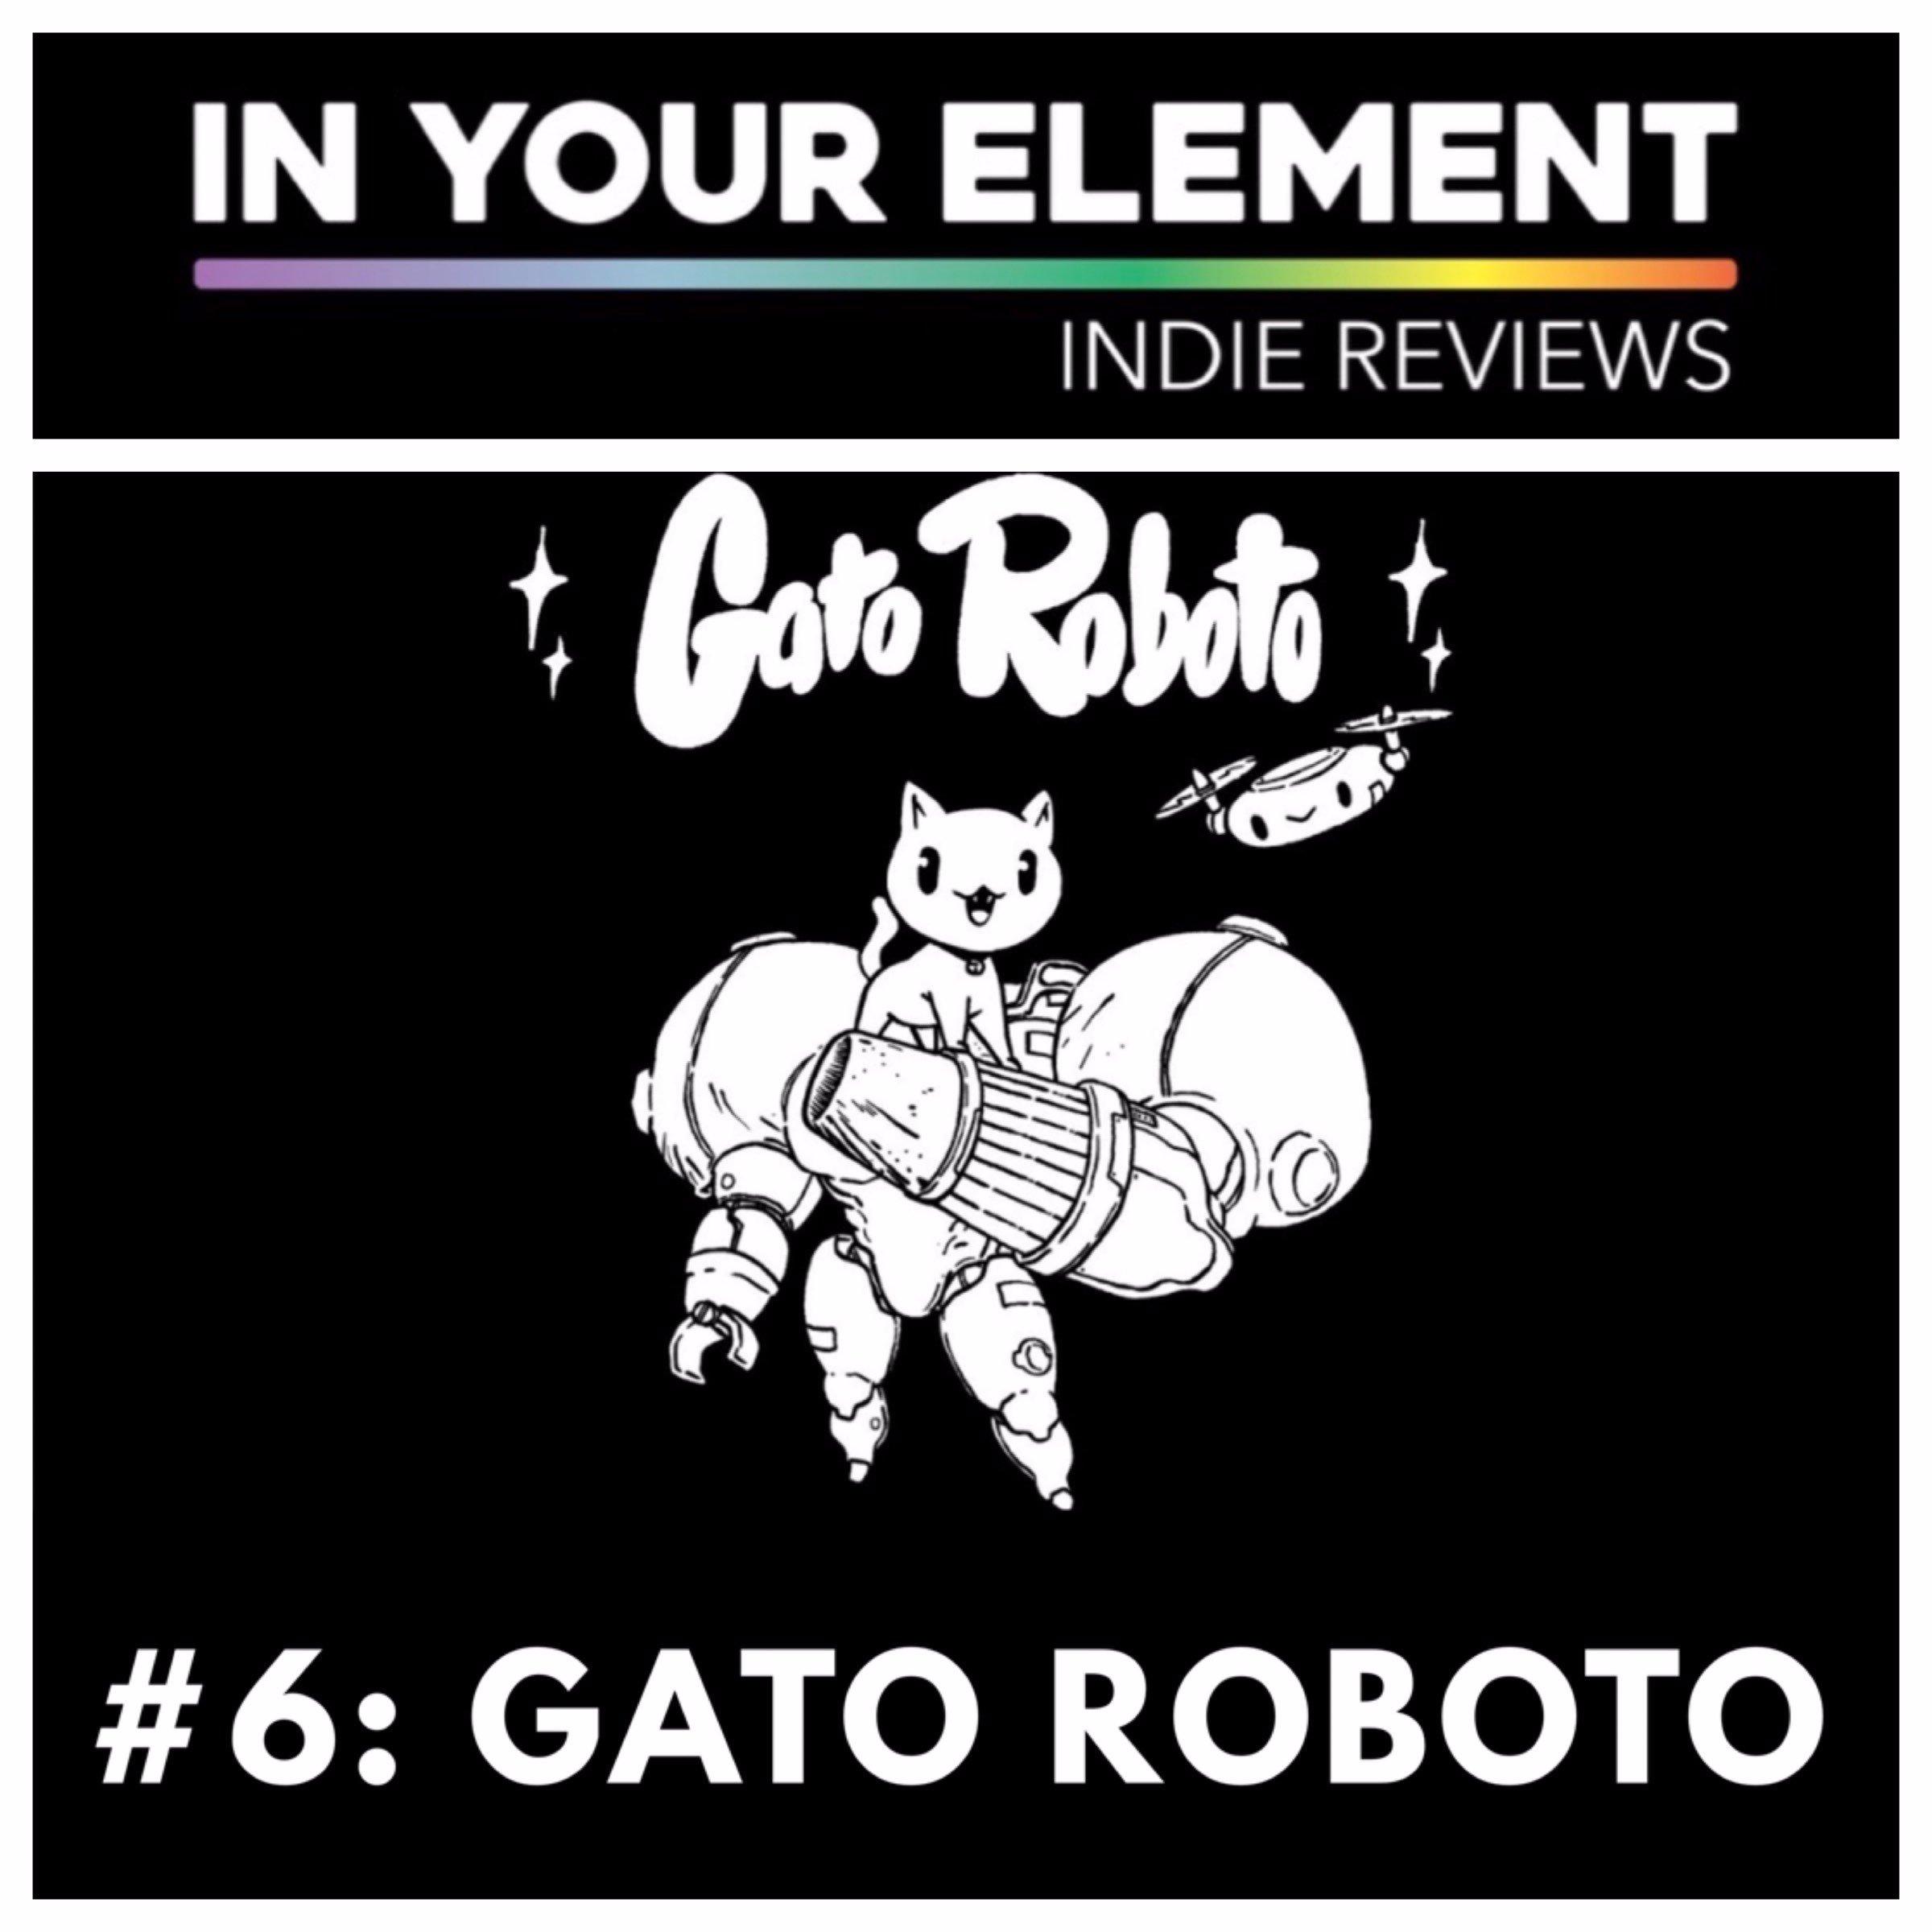 Indie Reviews #6: Gato Roboto